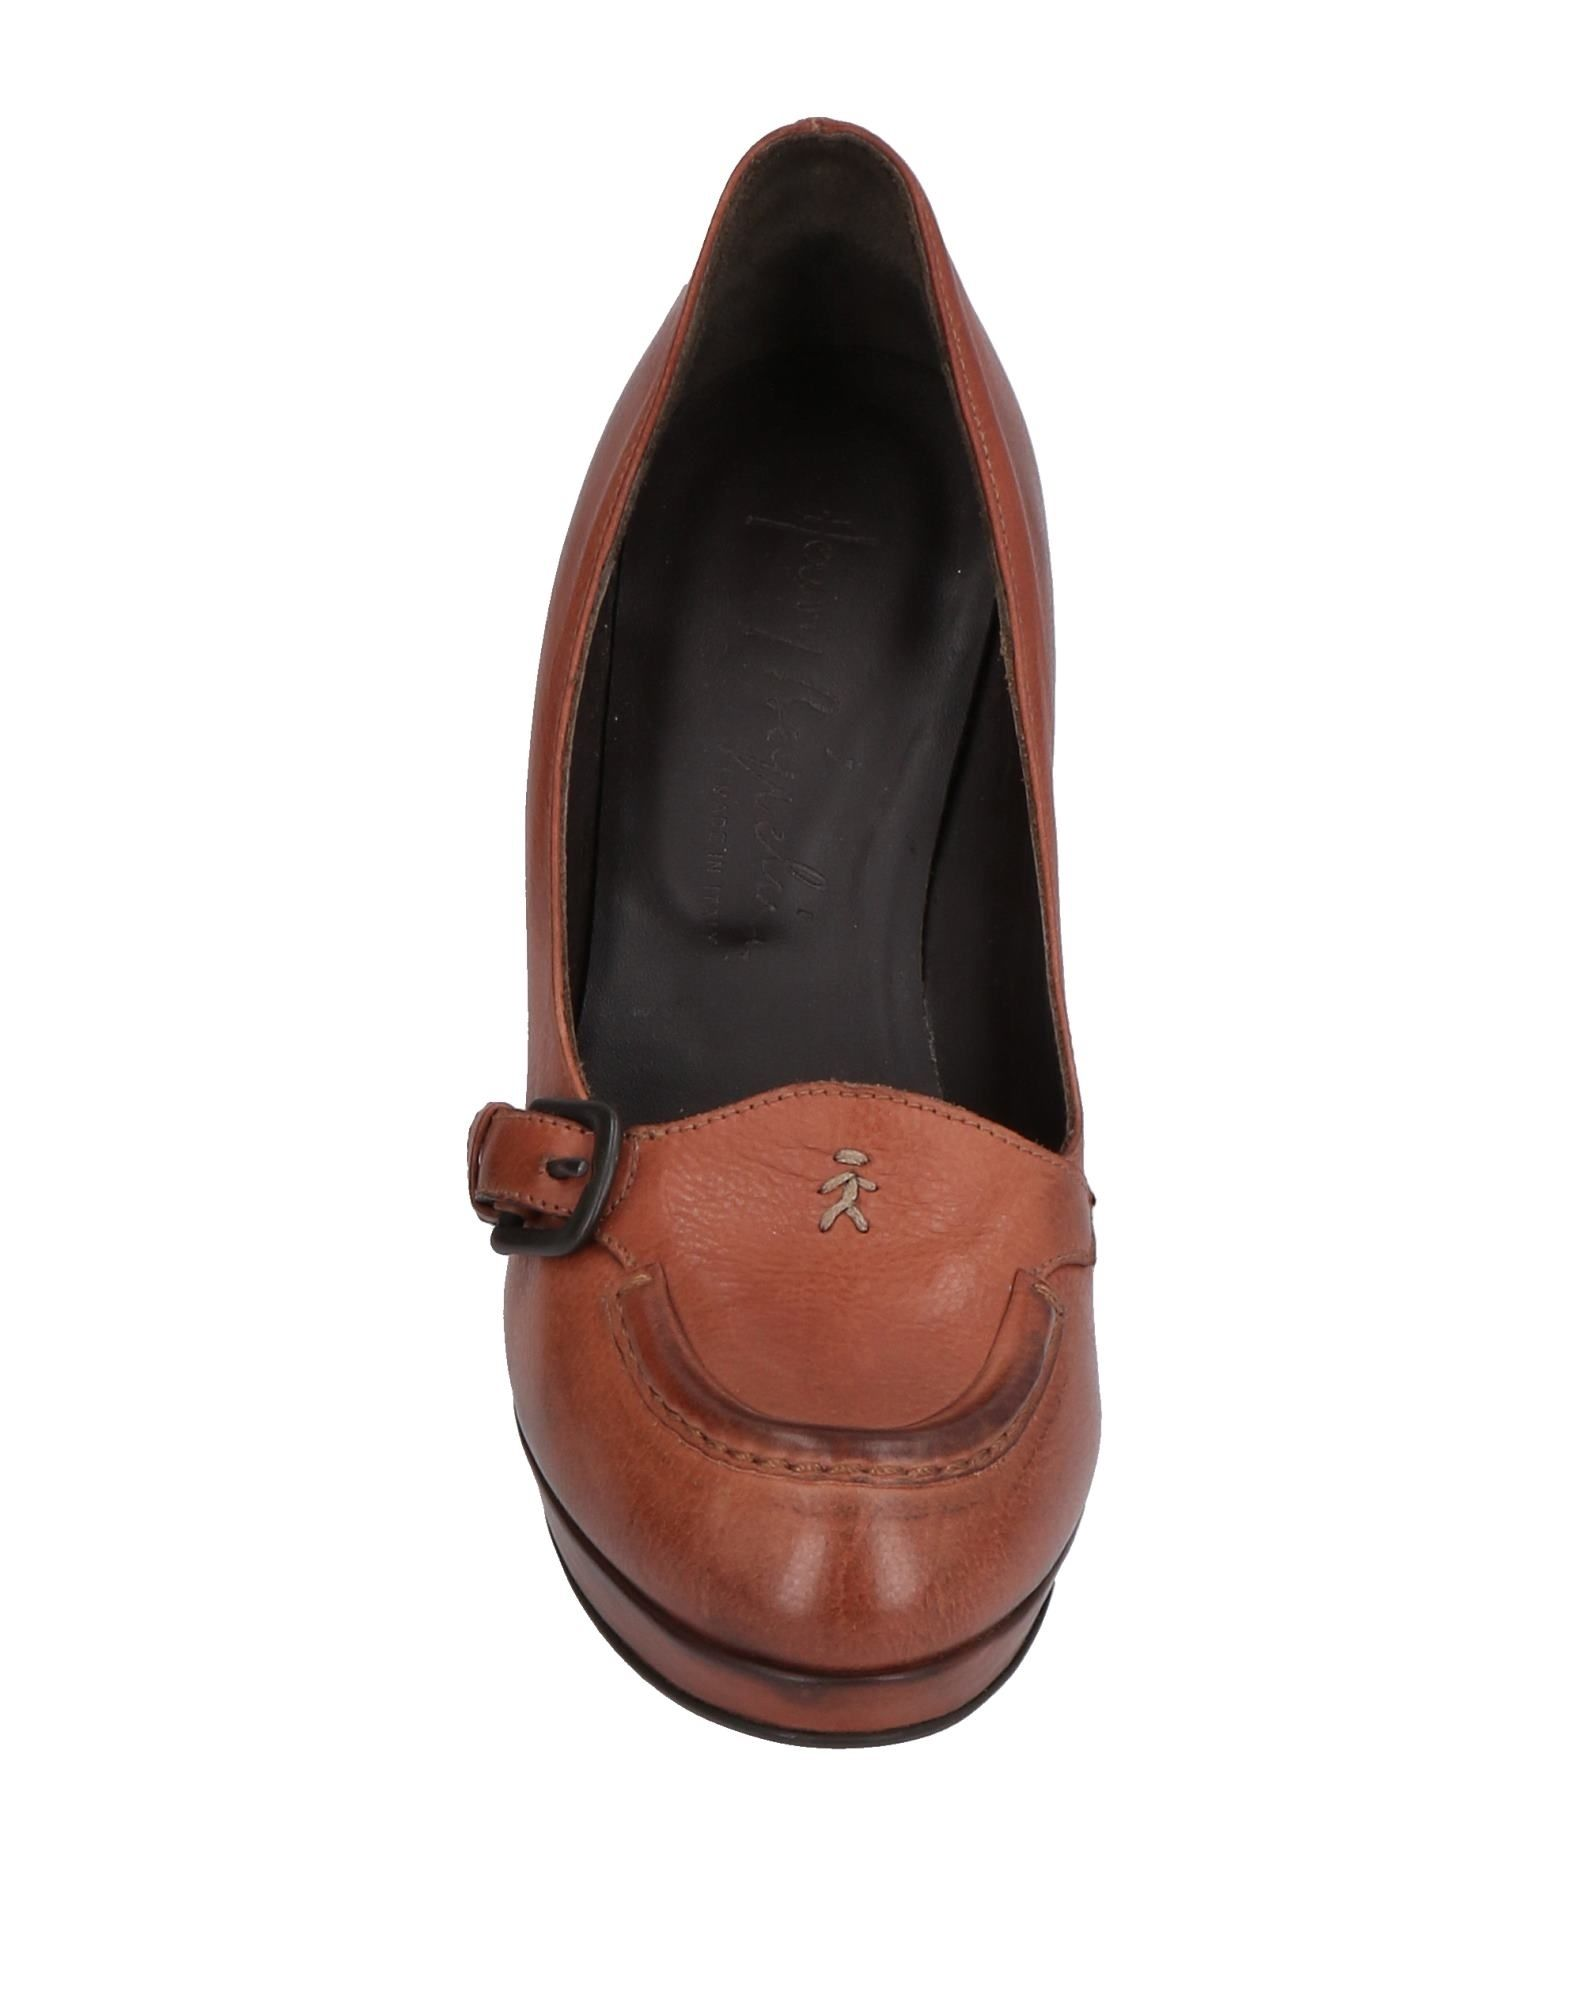 Henry Beguelin Mokassins Damen  11484336RCGut aussehende strapazierfähige Schuhe